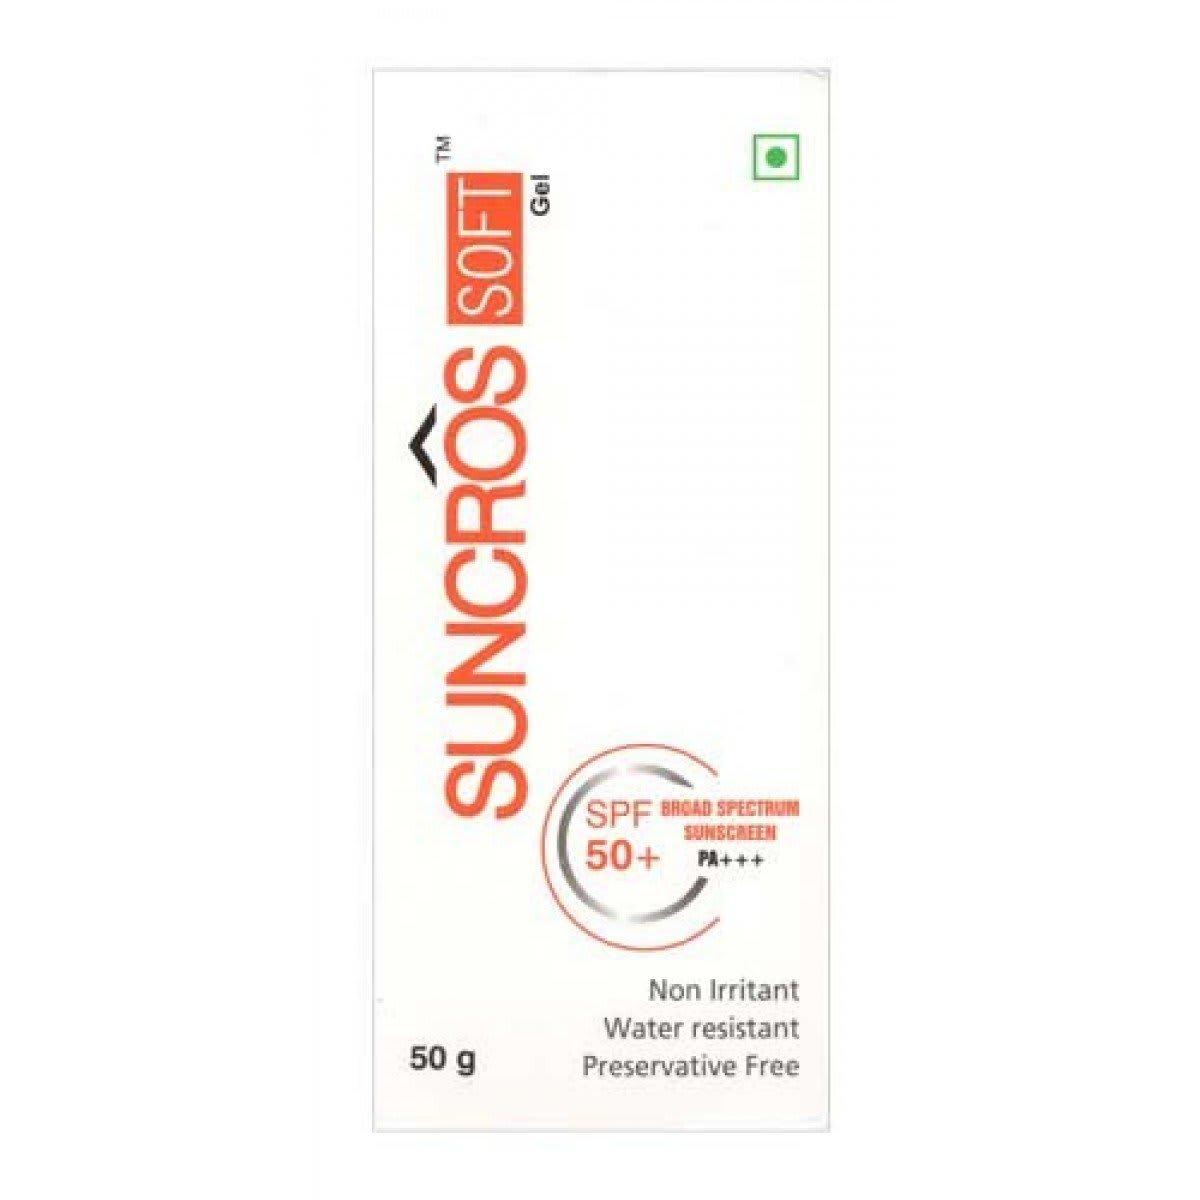 Suncros Soft Spf 50+ Gel